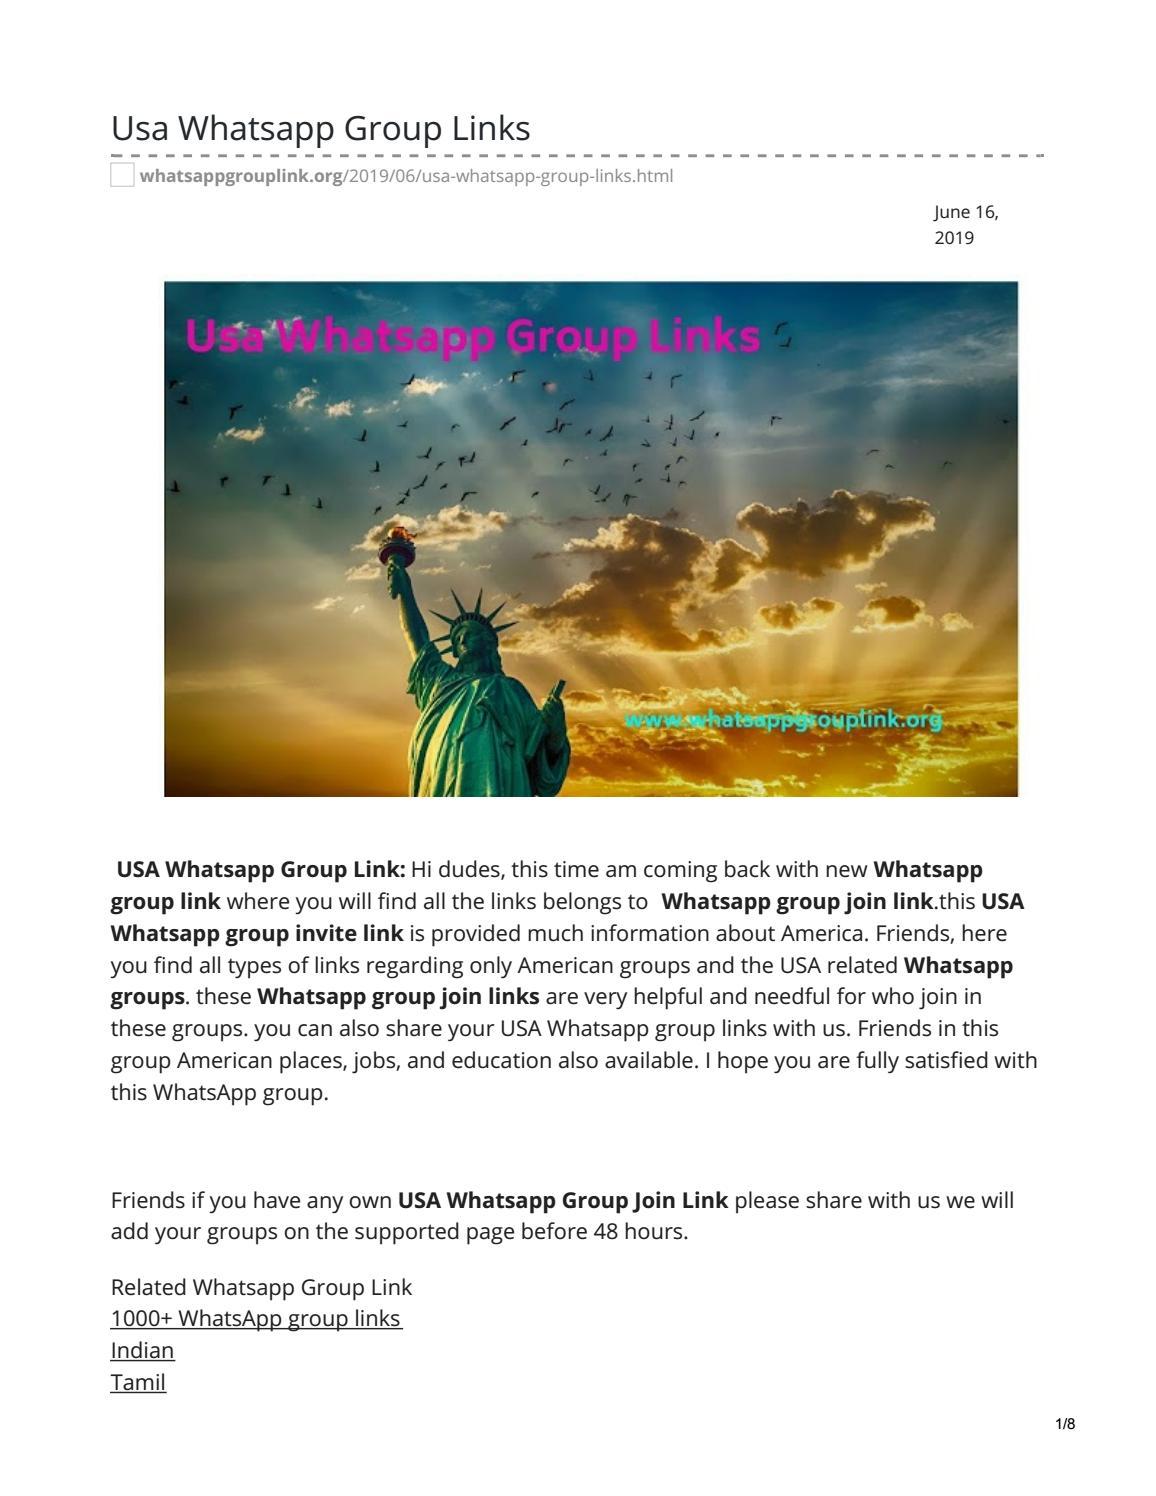 Usa Whatsapp Group Links by whatsappgrouplinks77 - issuu